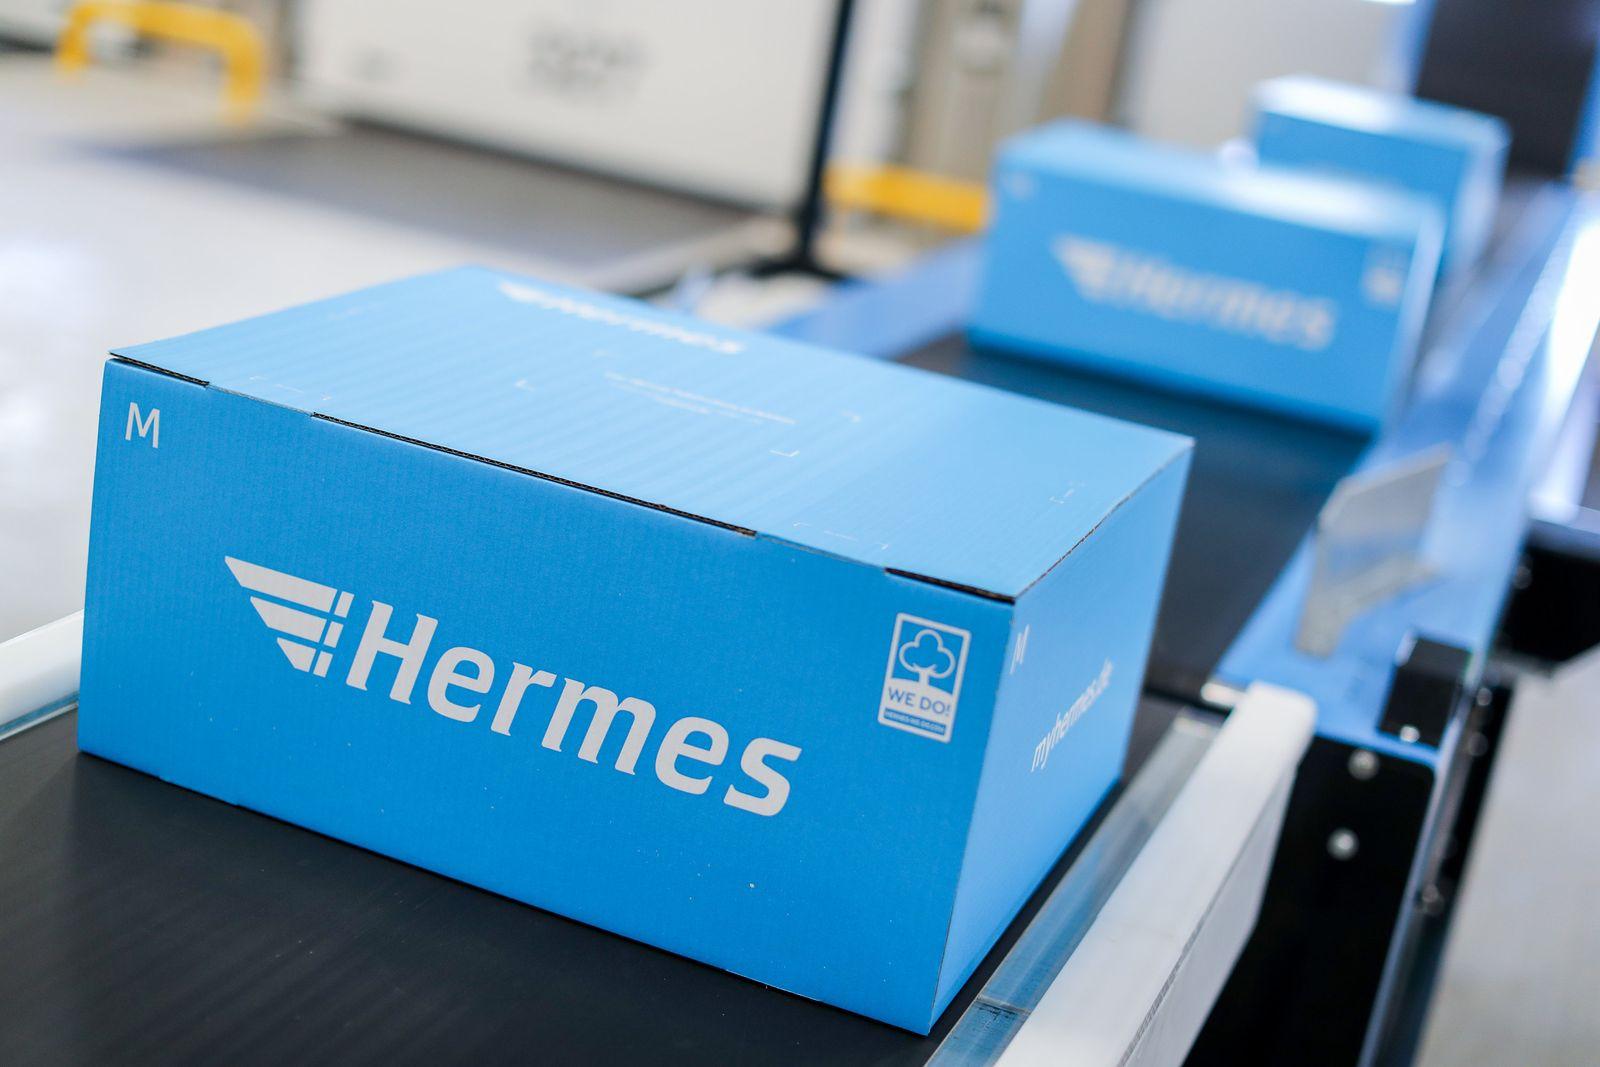 Paketlogistiker Hermes